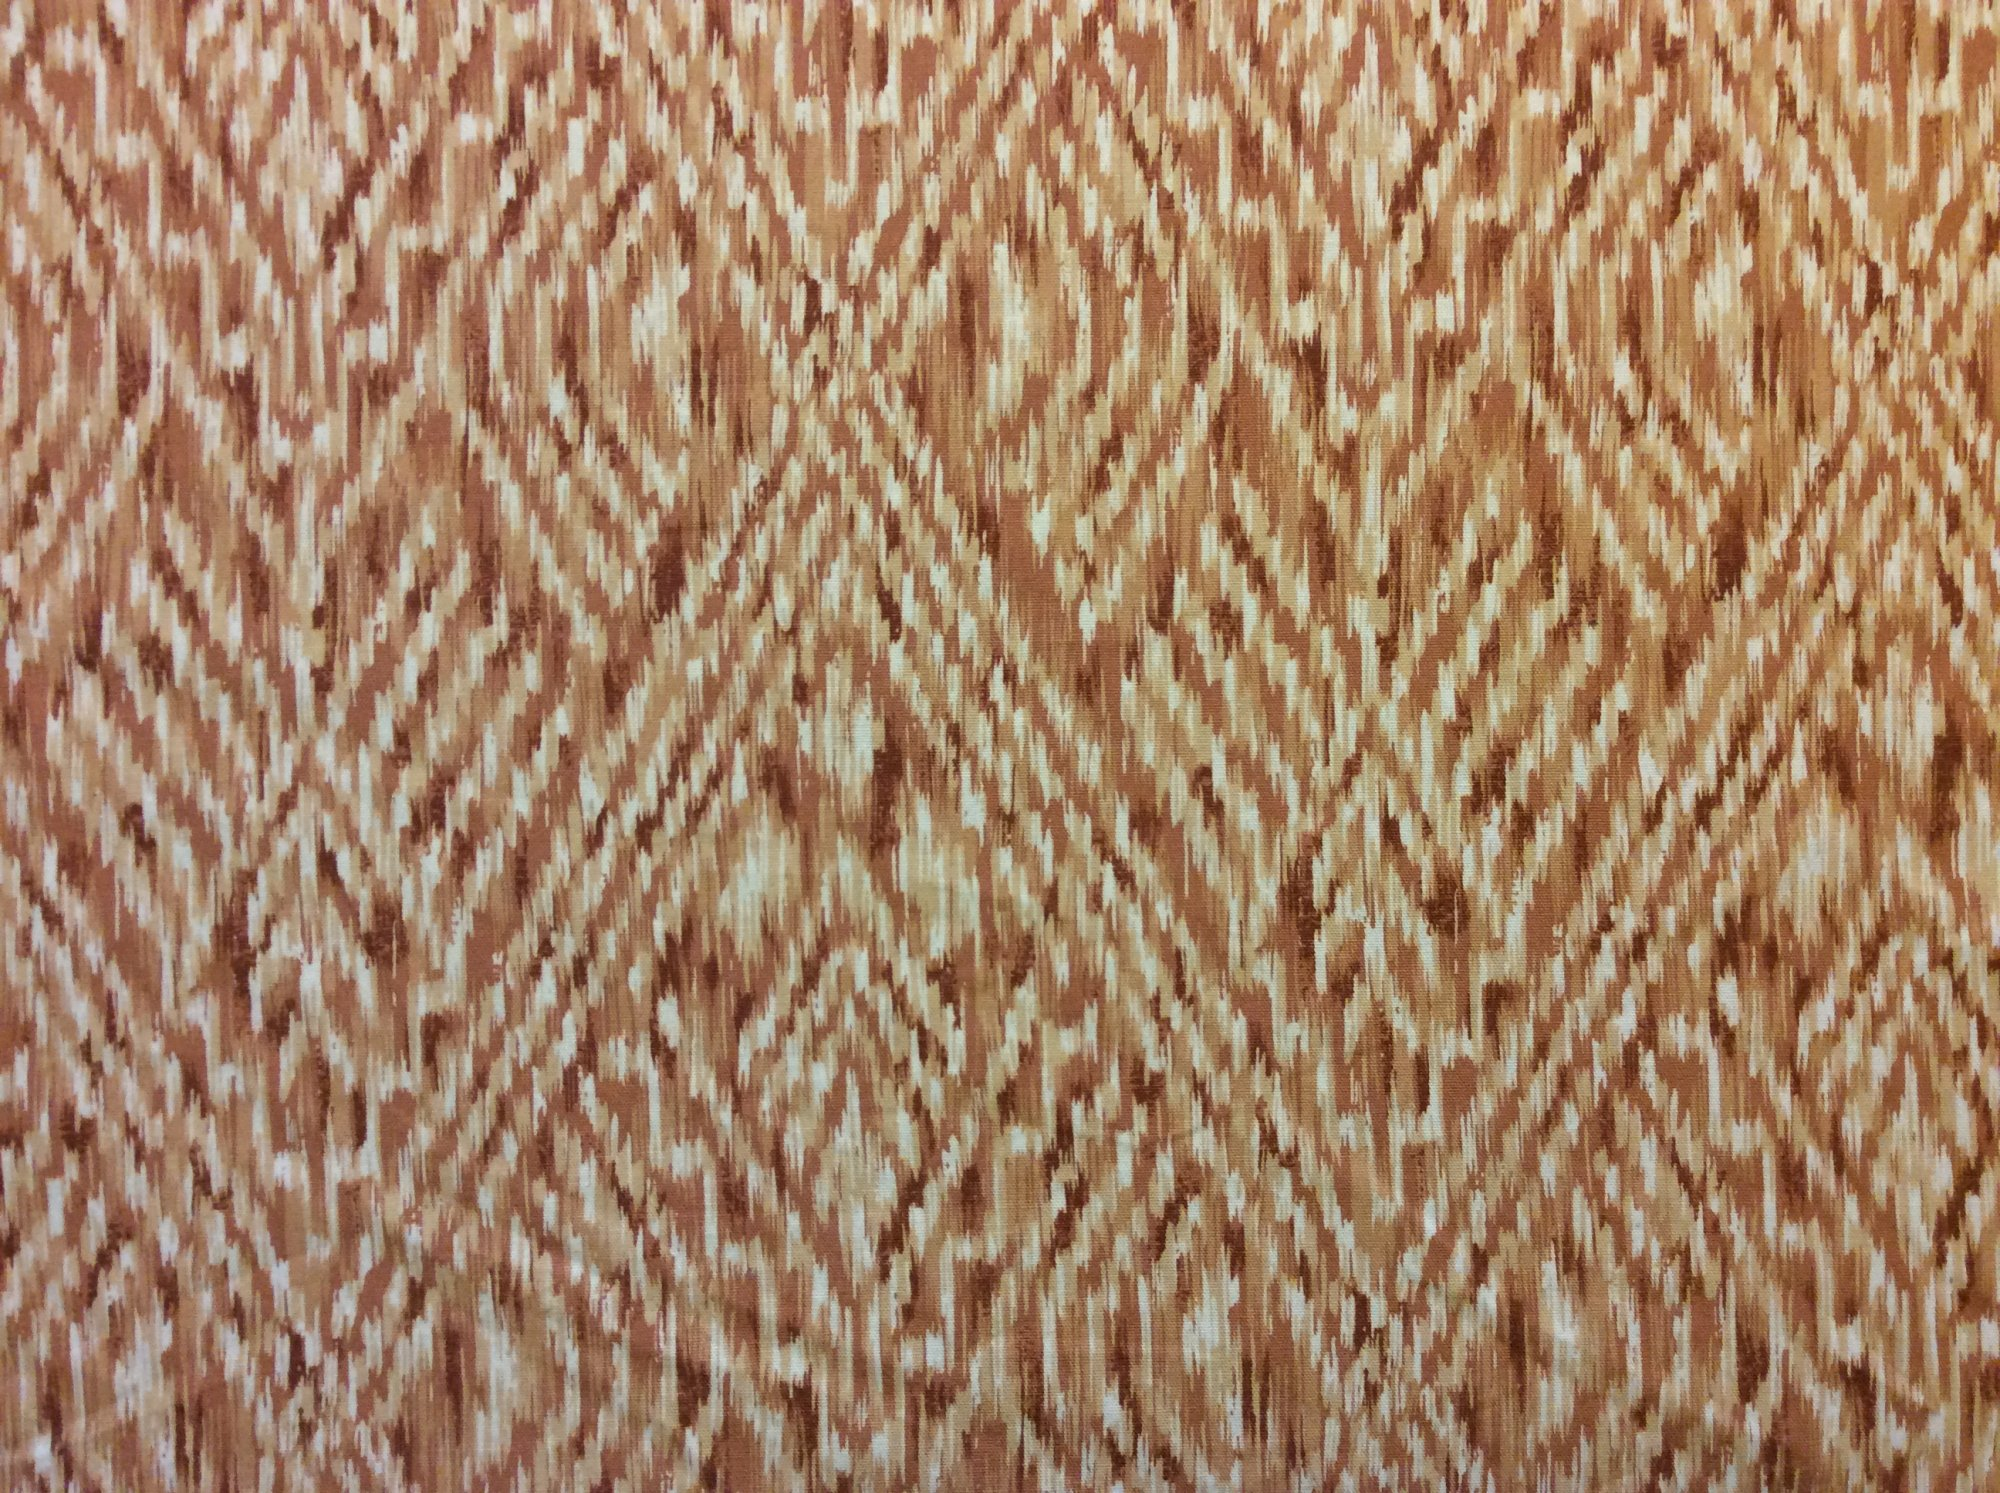 Ikat Tribal Orange Brown Cream Linen Texture Heavy Weight Cotton Fabric Drapery Fabric HD363